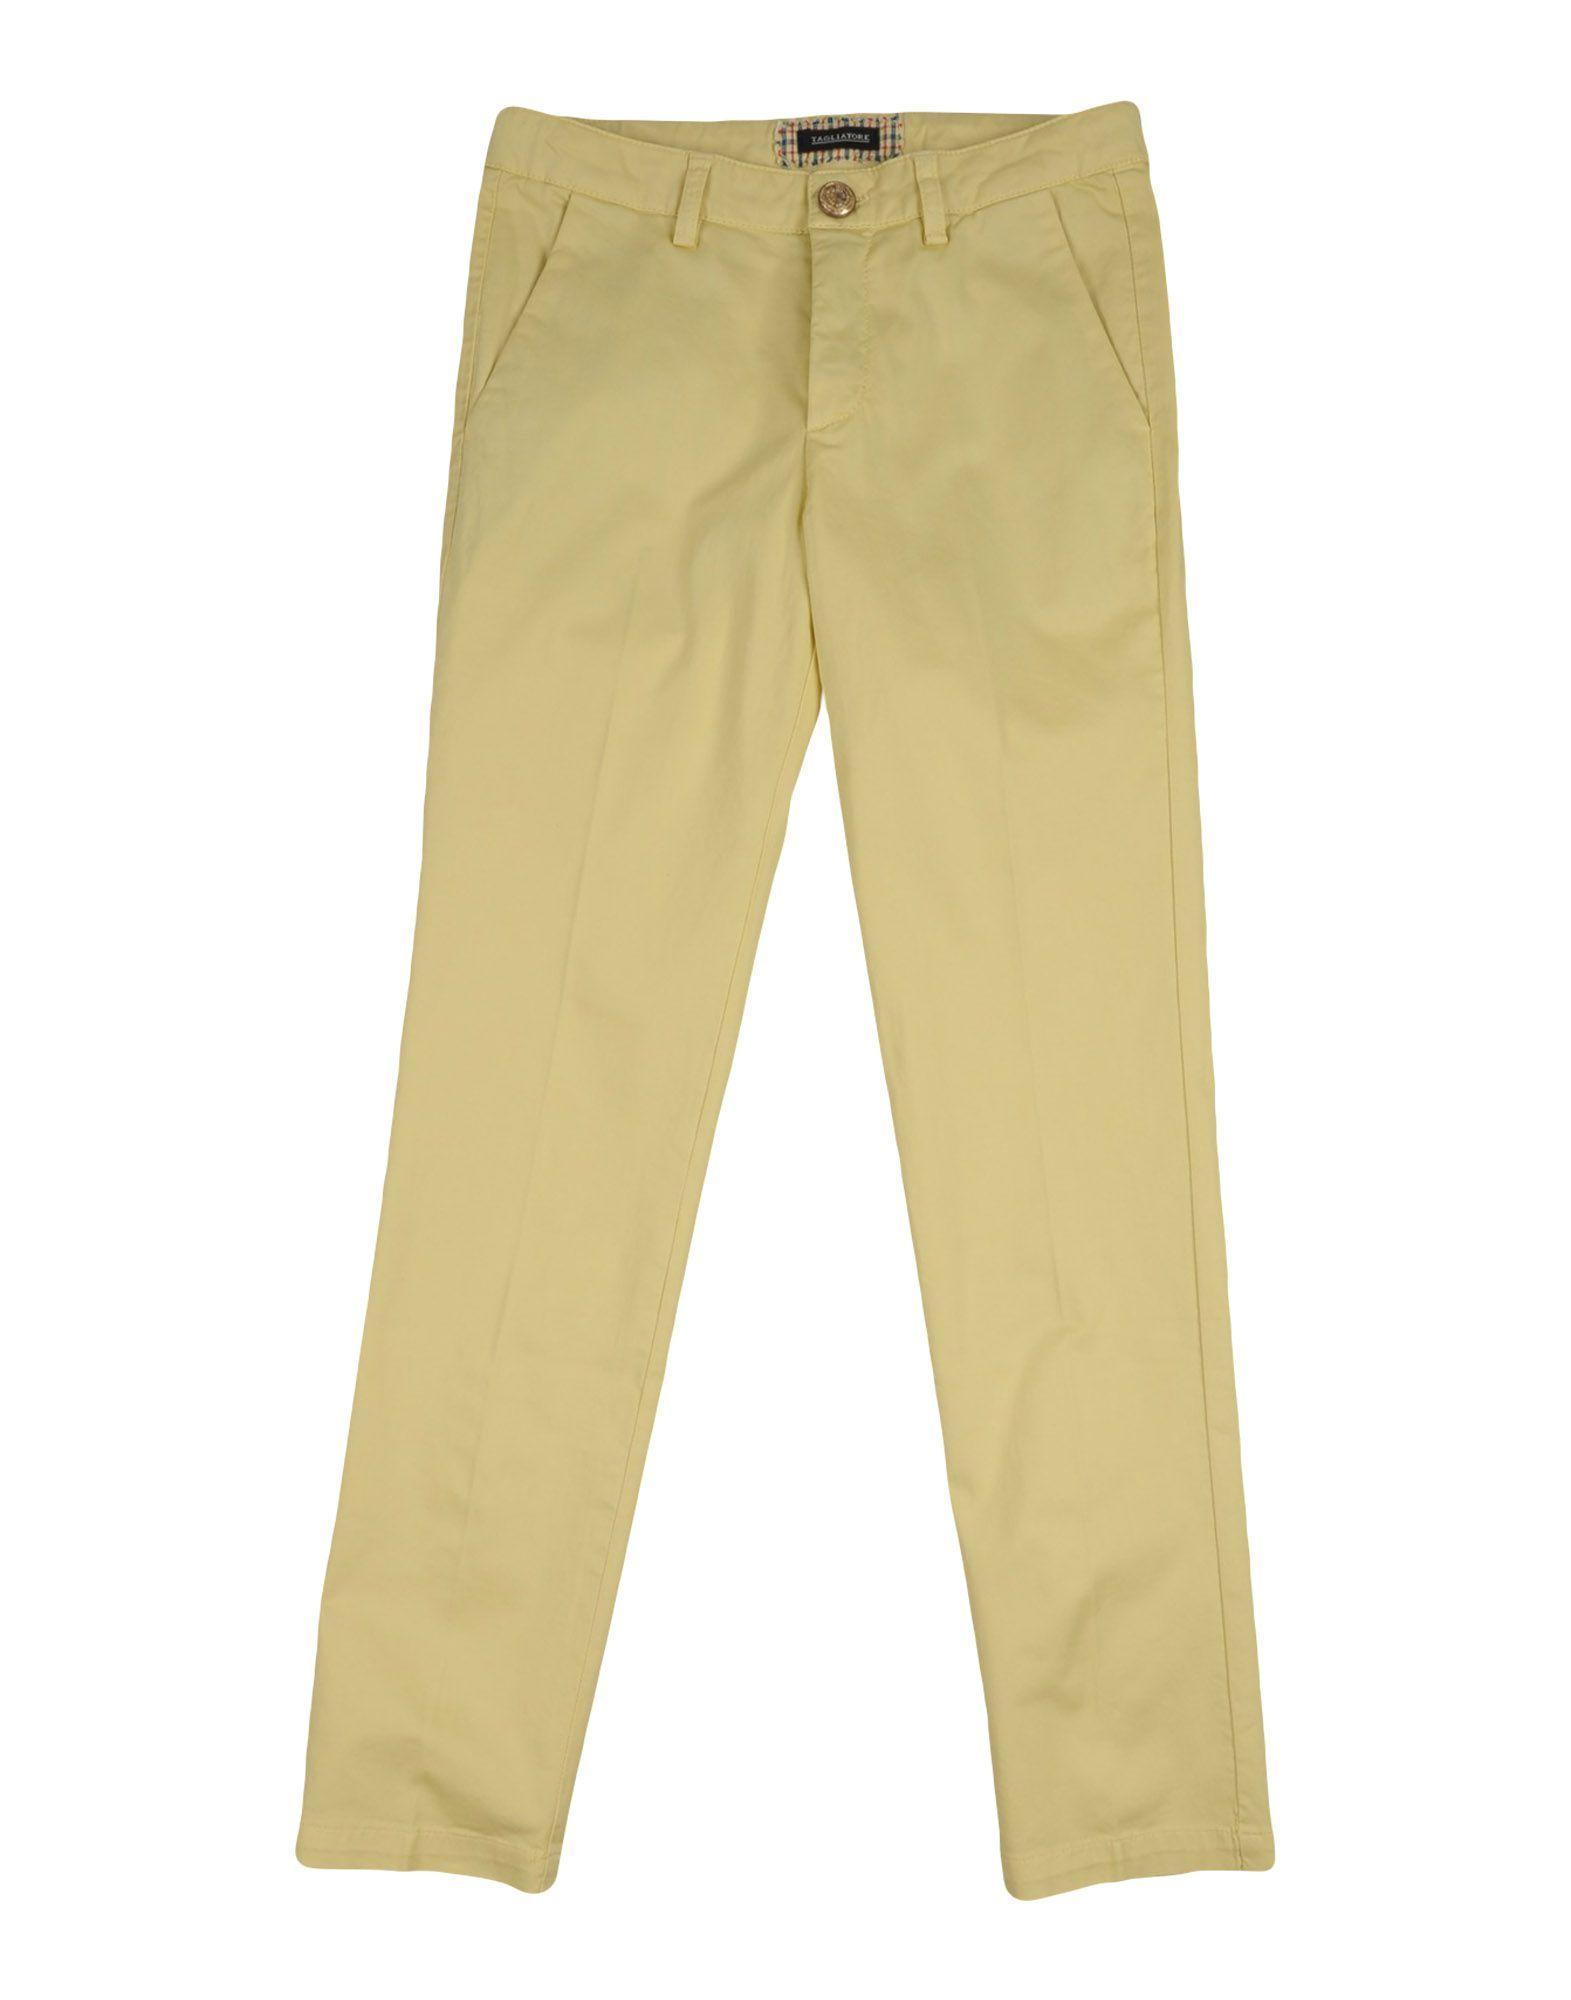 TROUSERS Tagliatore Yellow Boy Cotton